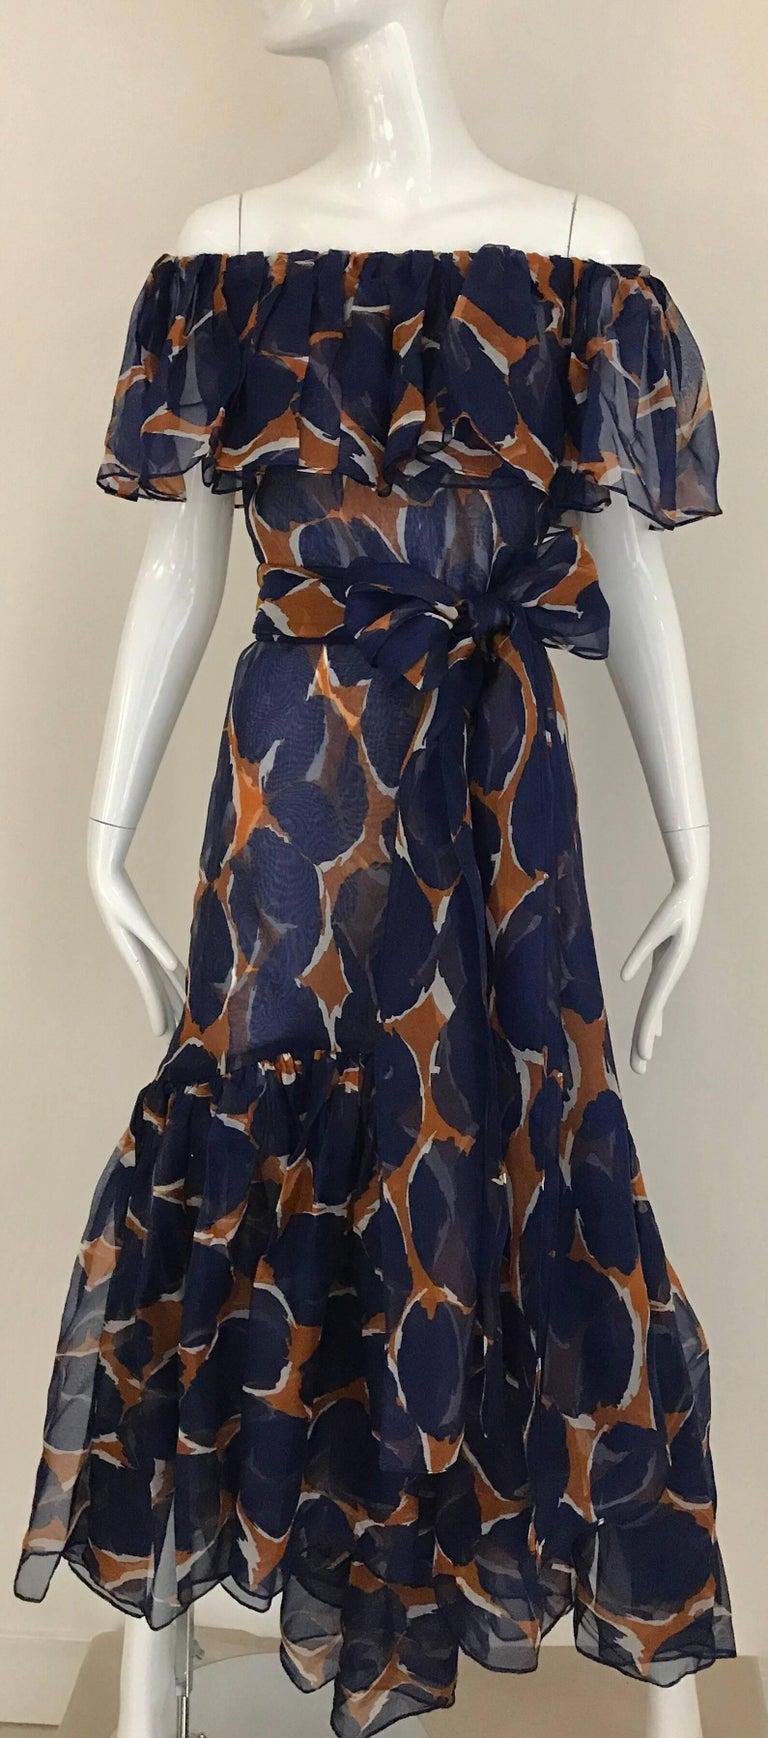 Vintage Yves Saint Laurent Blue and Brown Print Flamenco Style Silk Dress 10